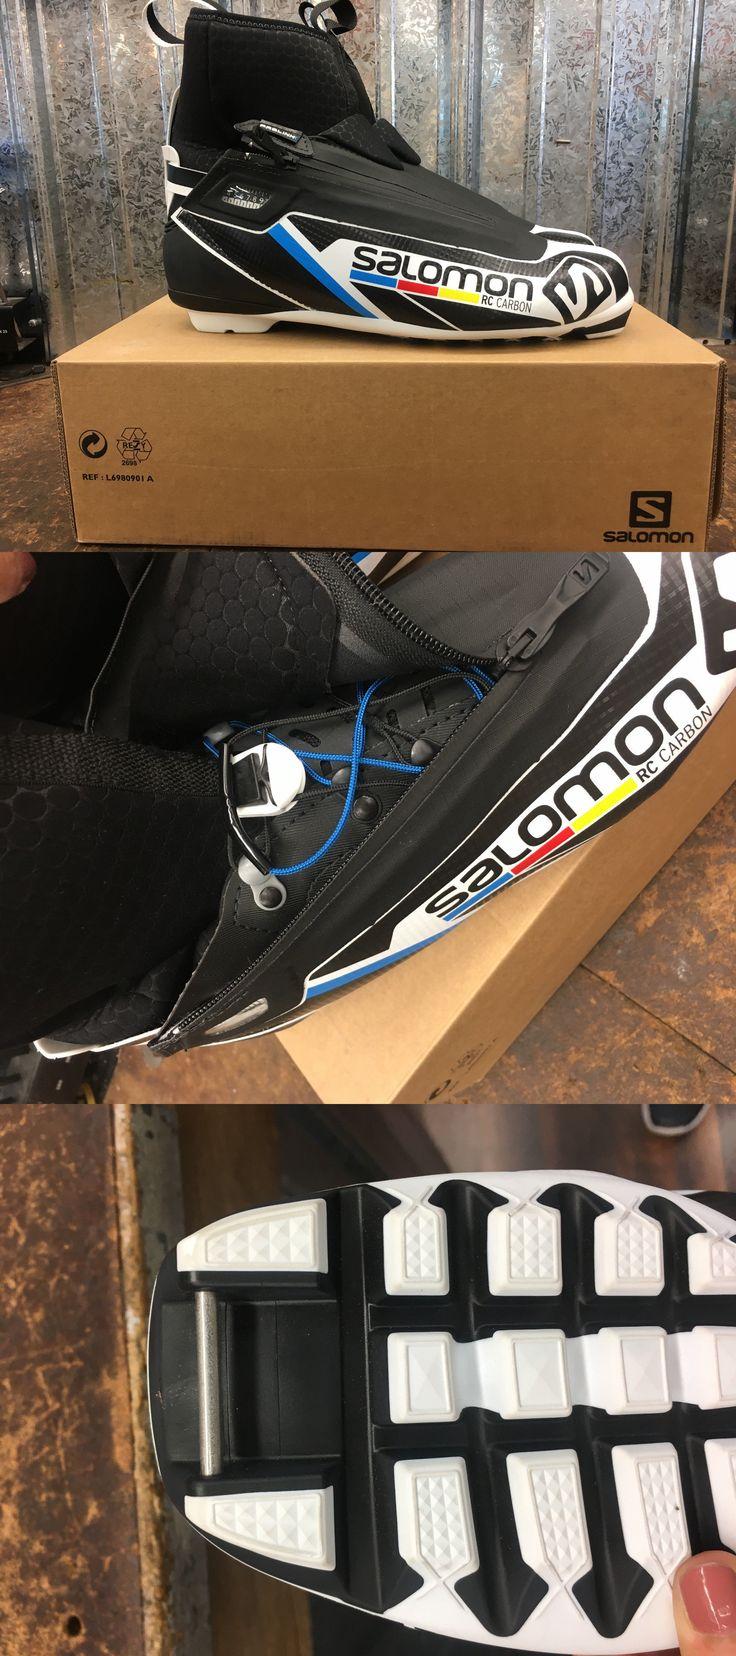 Boots 36266: Salomon Rc Carbon Prolink Skate Ski Boot, Size 10.5Us 10Uk -> BUY IT NOW ONLY: $200 on eBay!